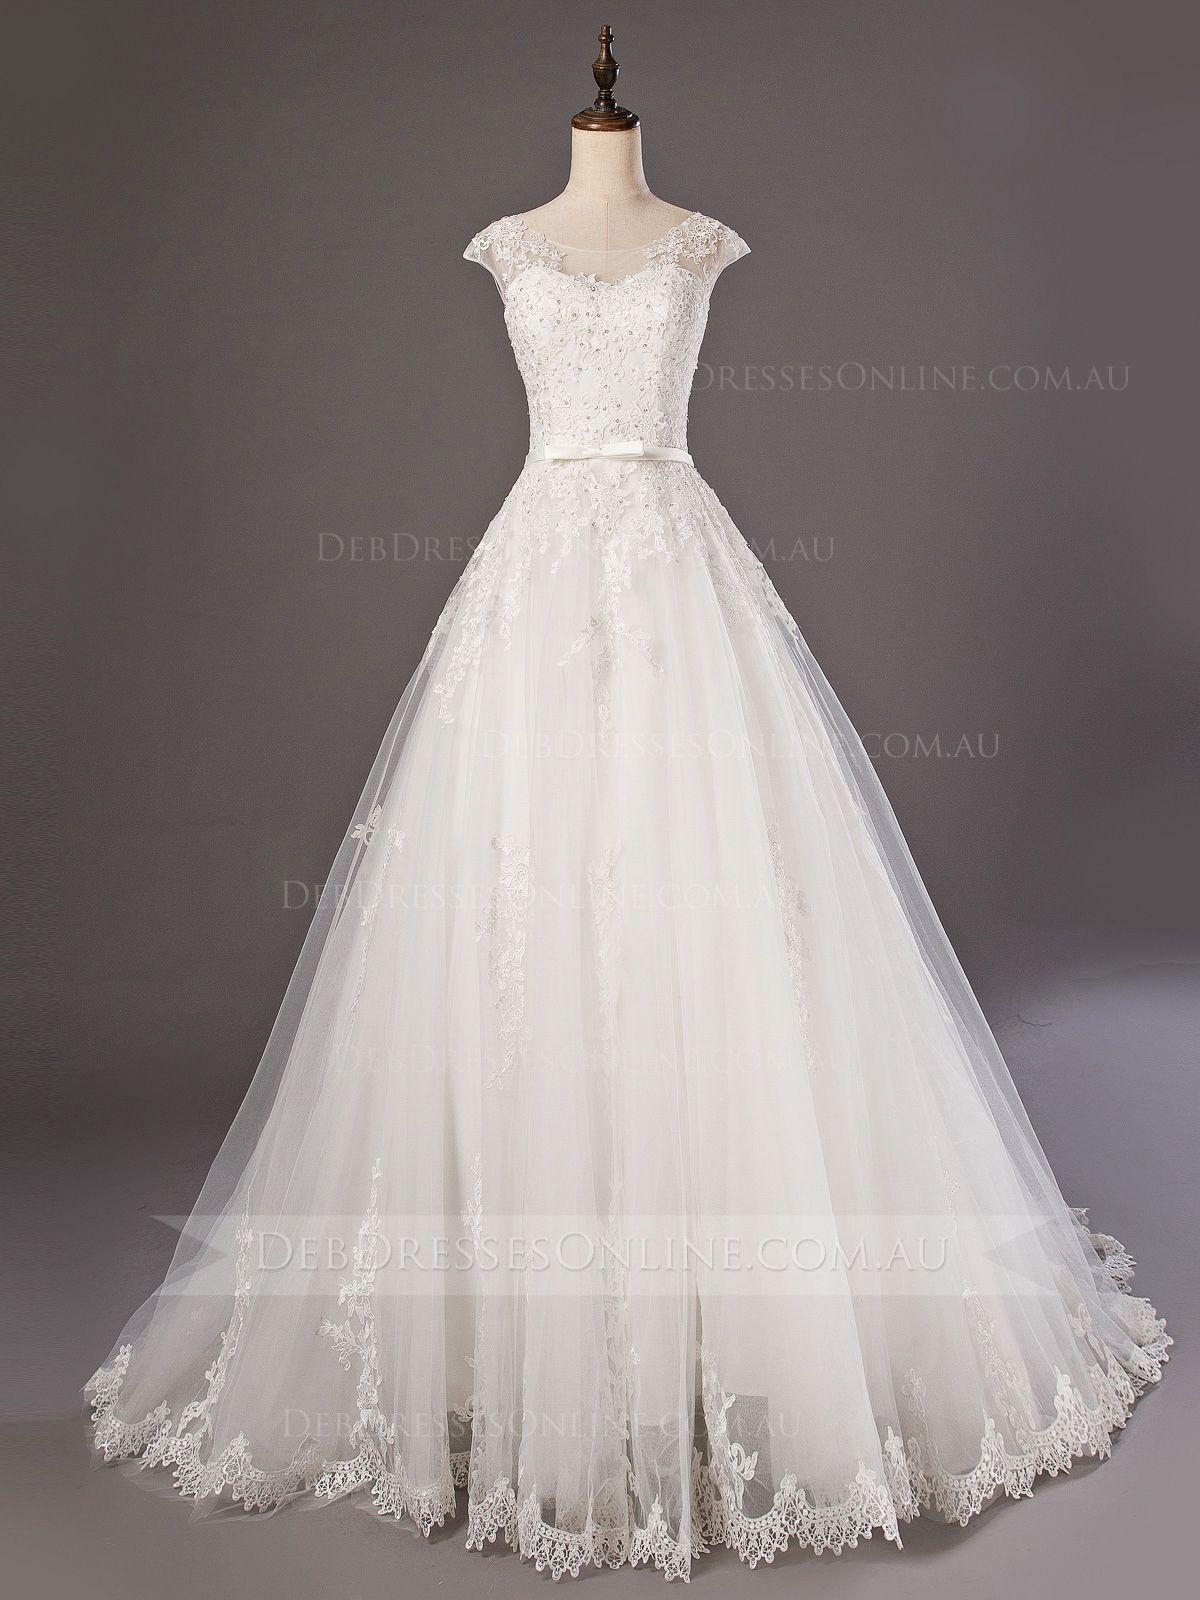 Debdressesaustralia chicdebdress plussizedebdress debutantegown